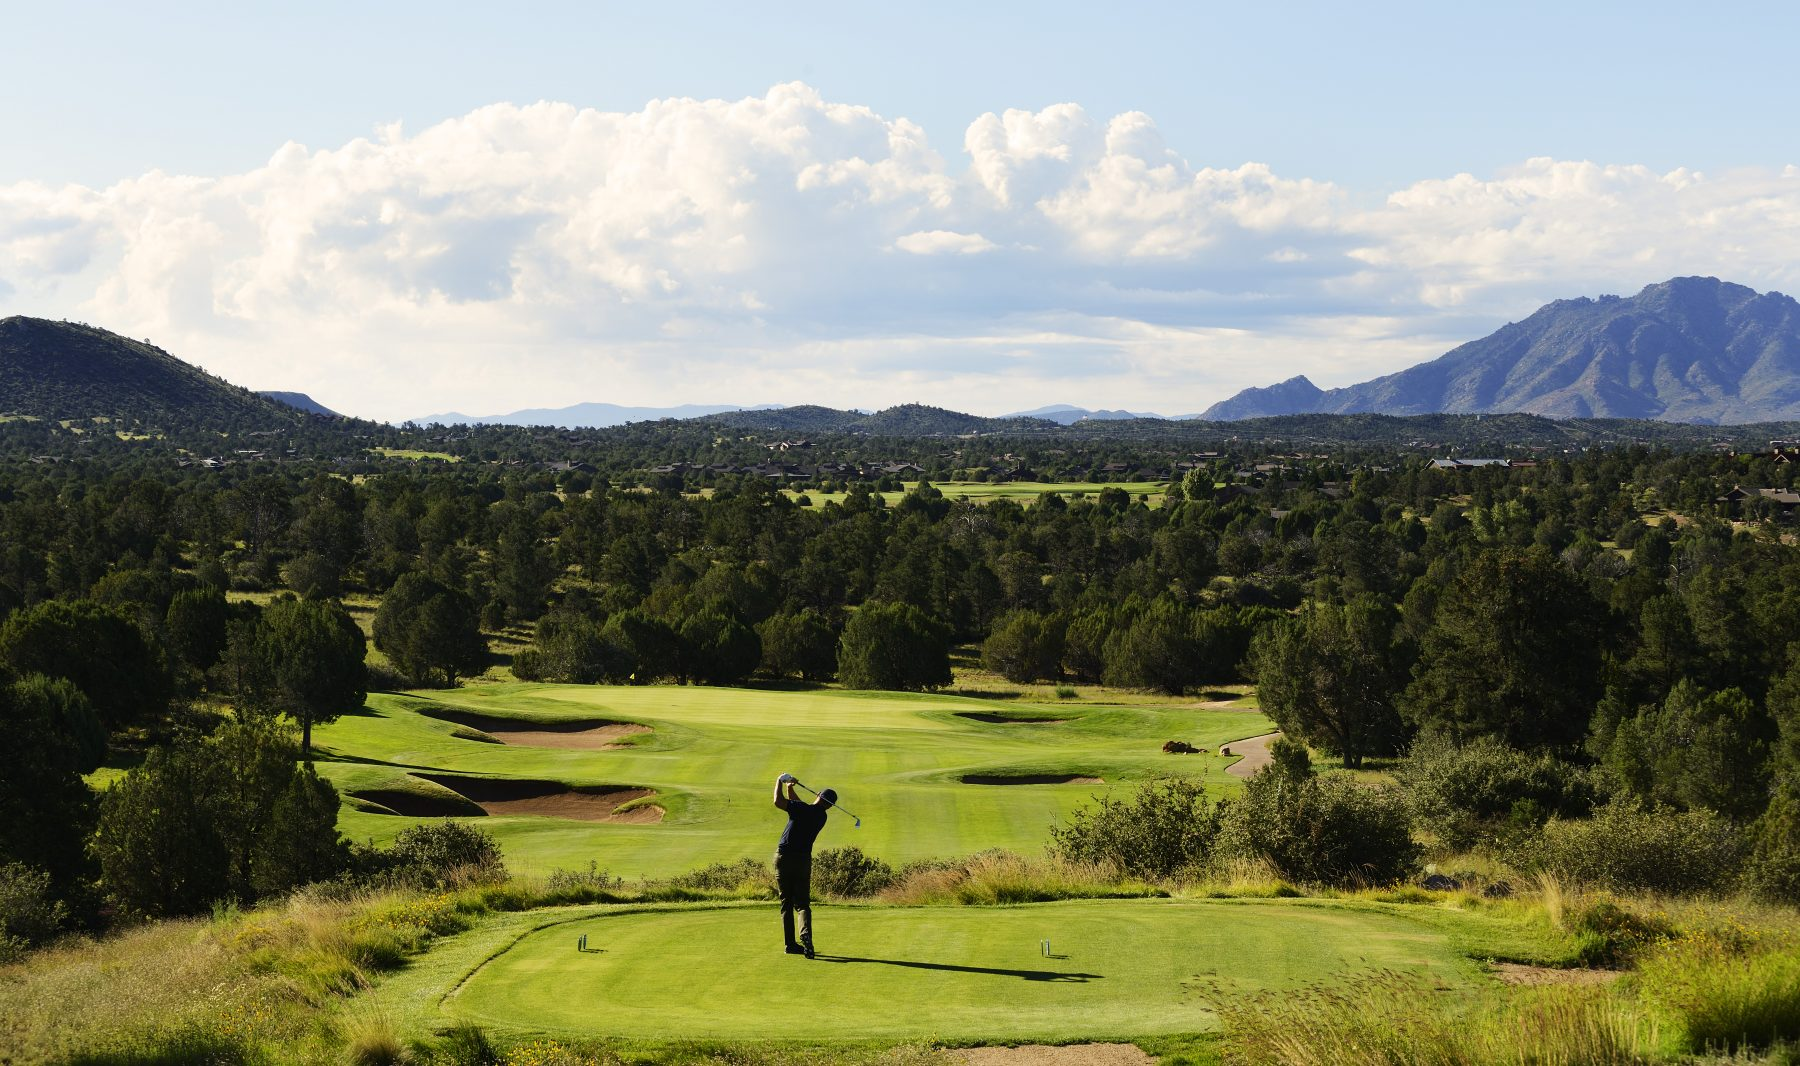 Northern Arizona golfing at Talking Rock